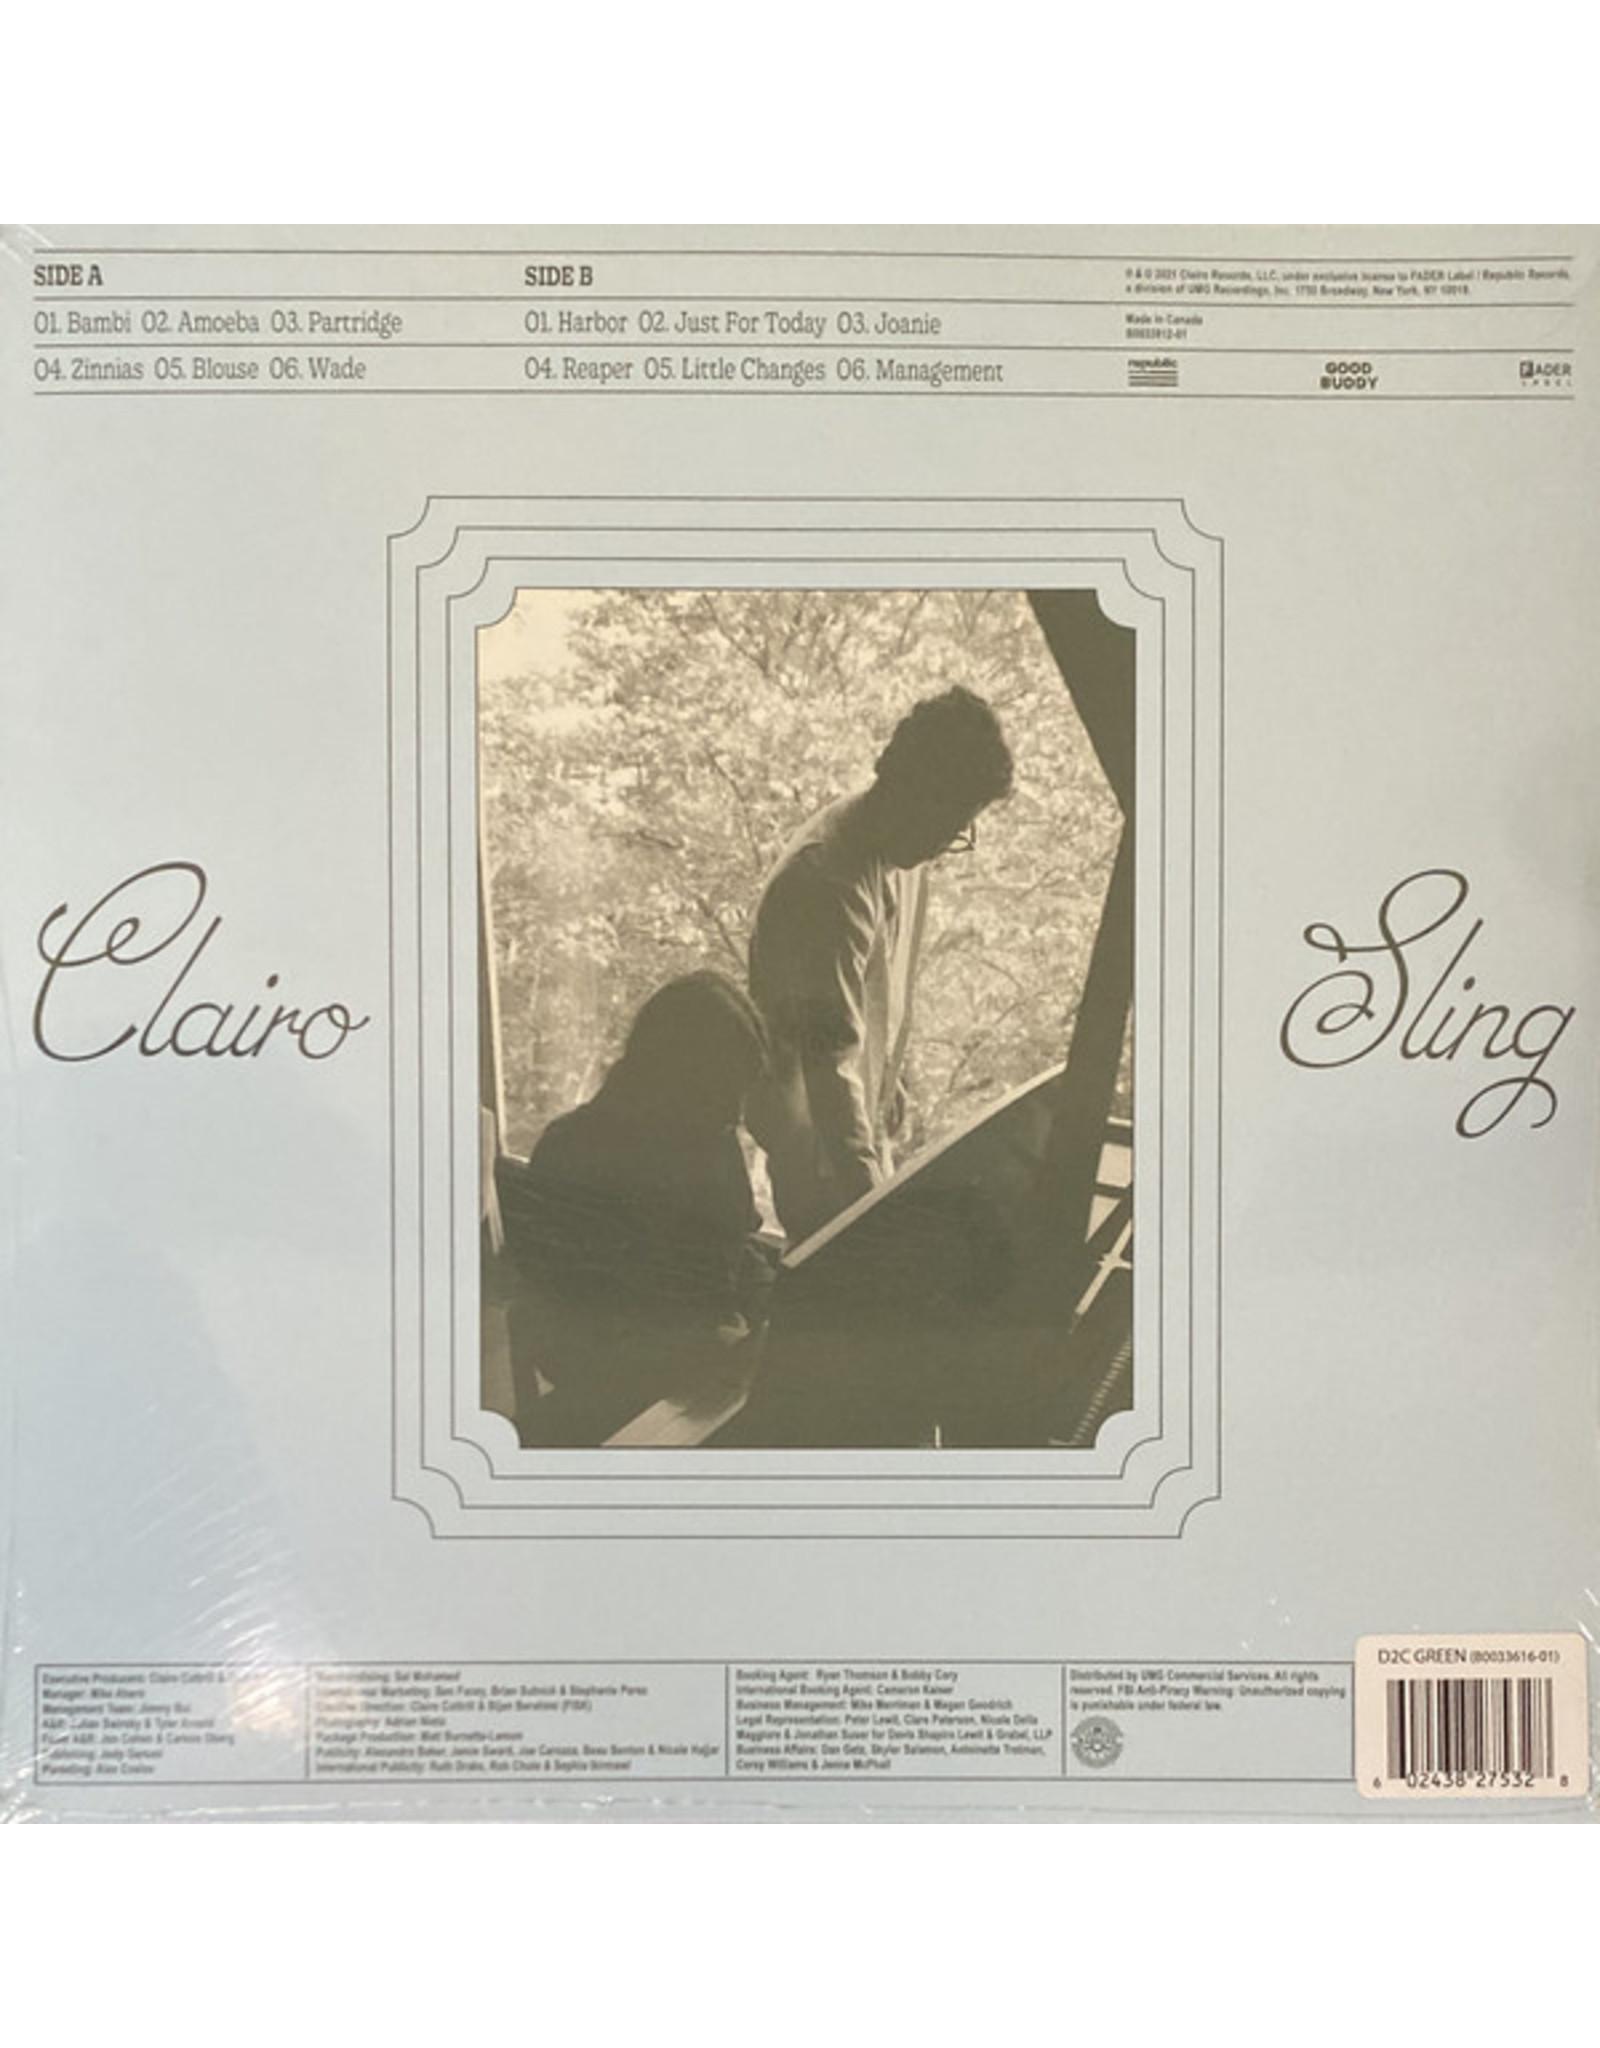 Clairo - Sling (Exclusive Green Vinyl)